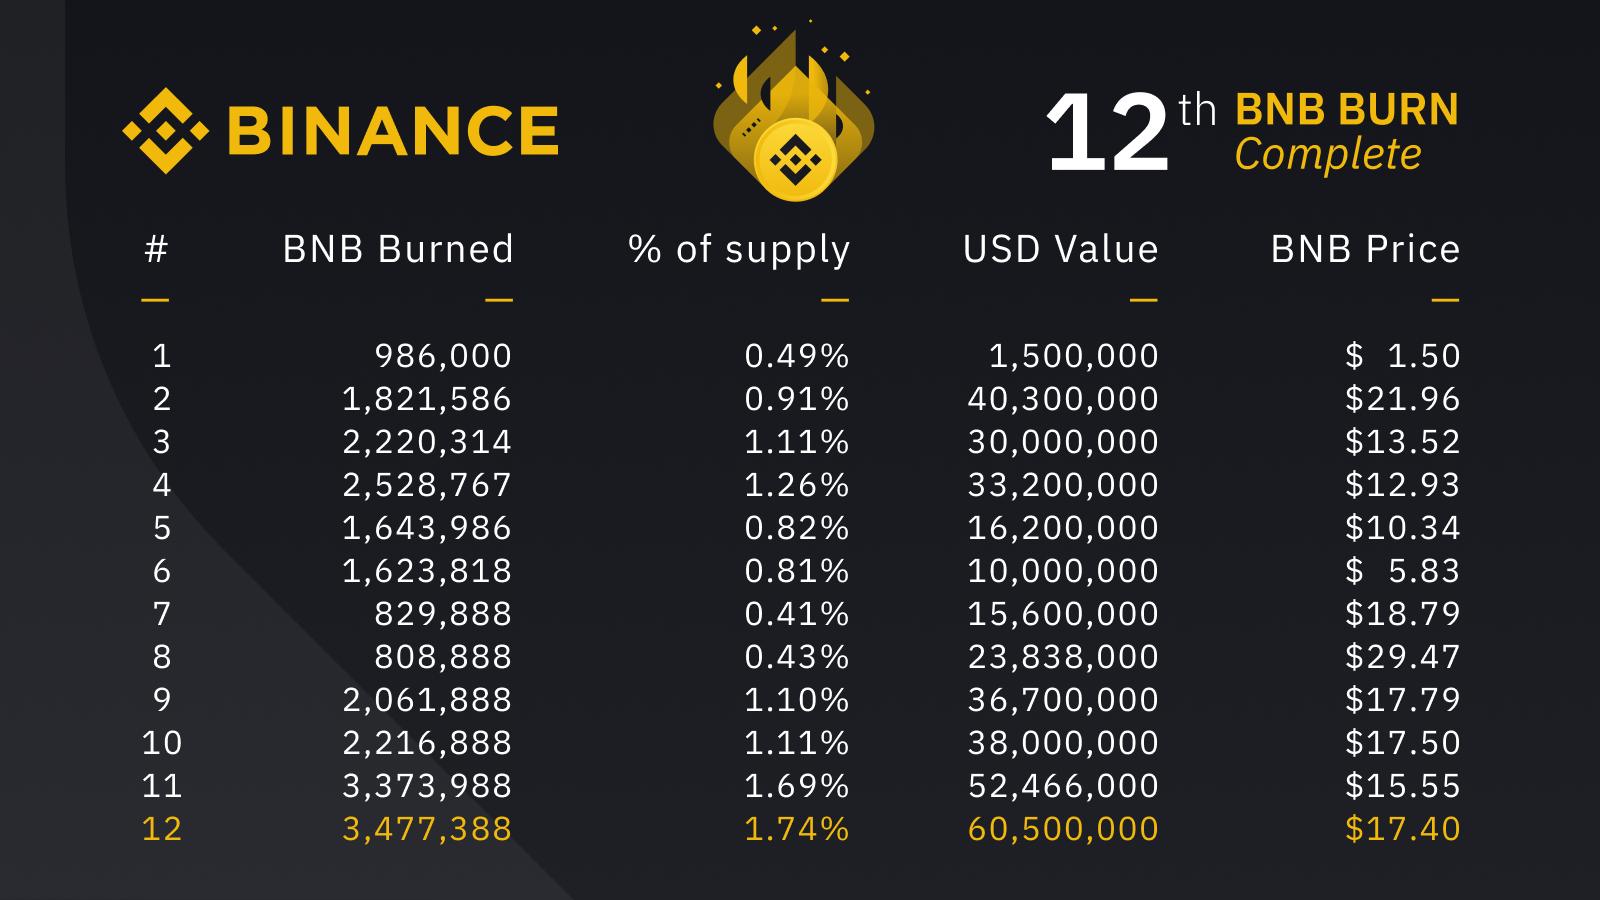 Binance Token Burn Record